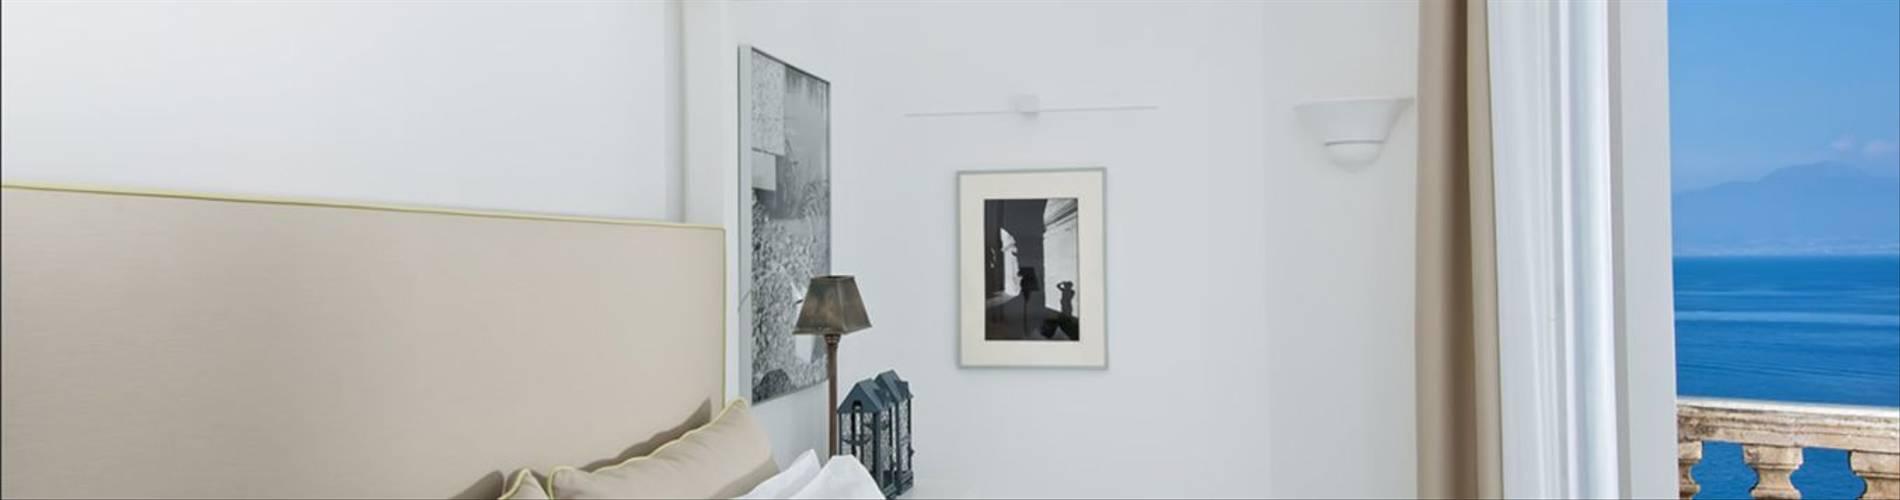 Bellevue Syrene, Sorrento, Italy, Camelia Suite (4).jpg